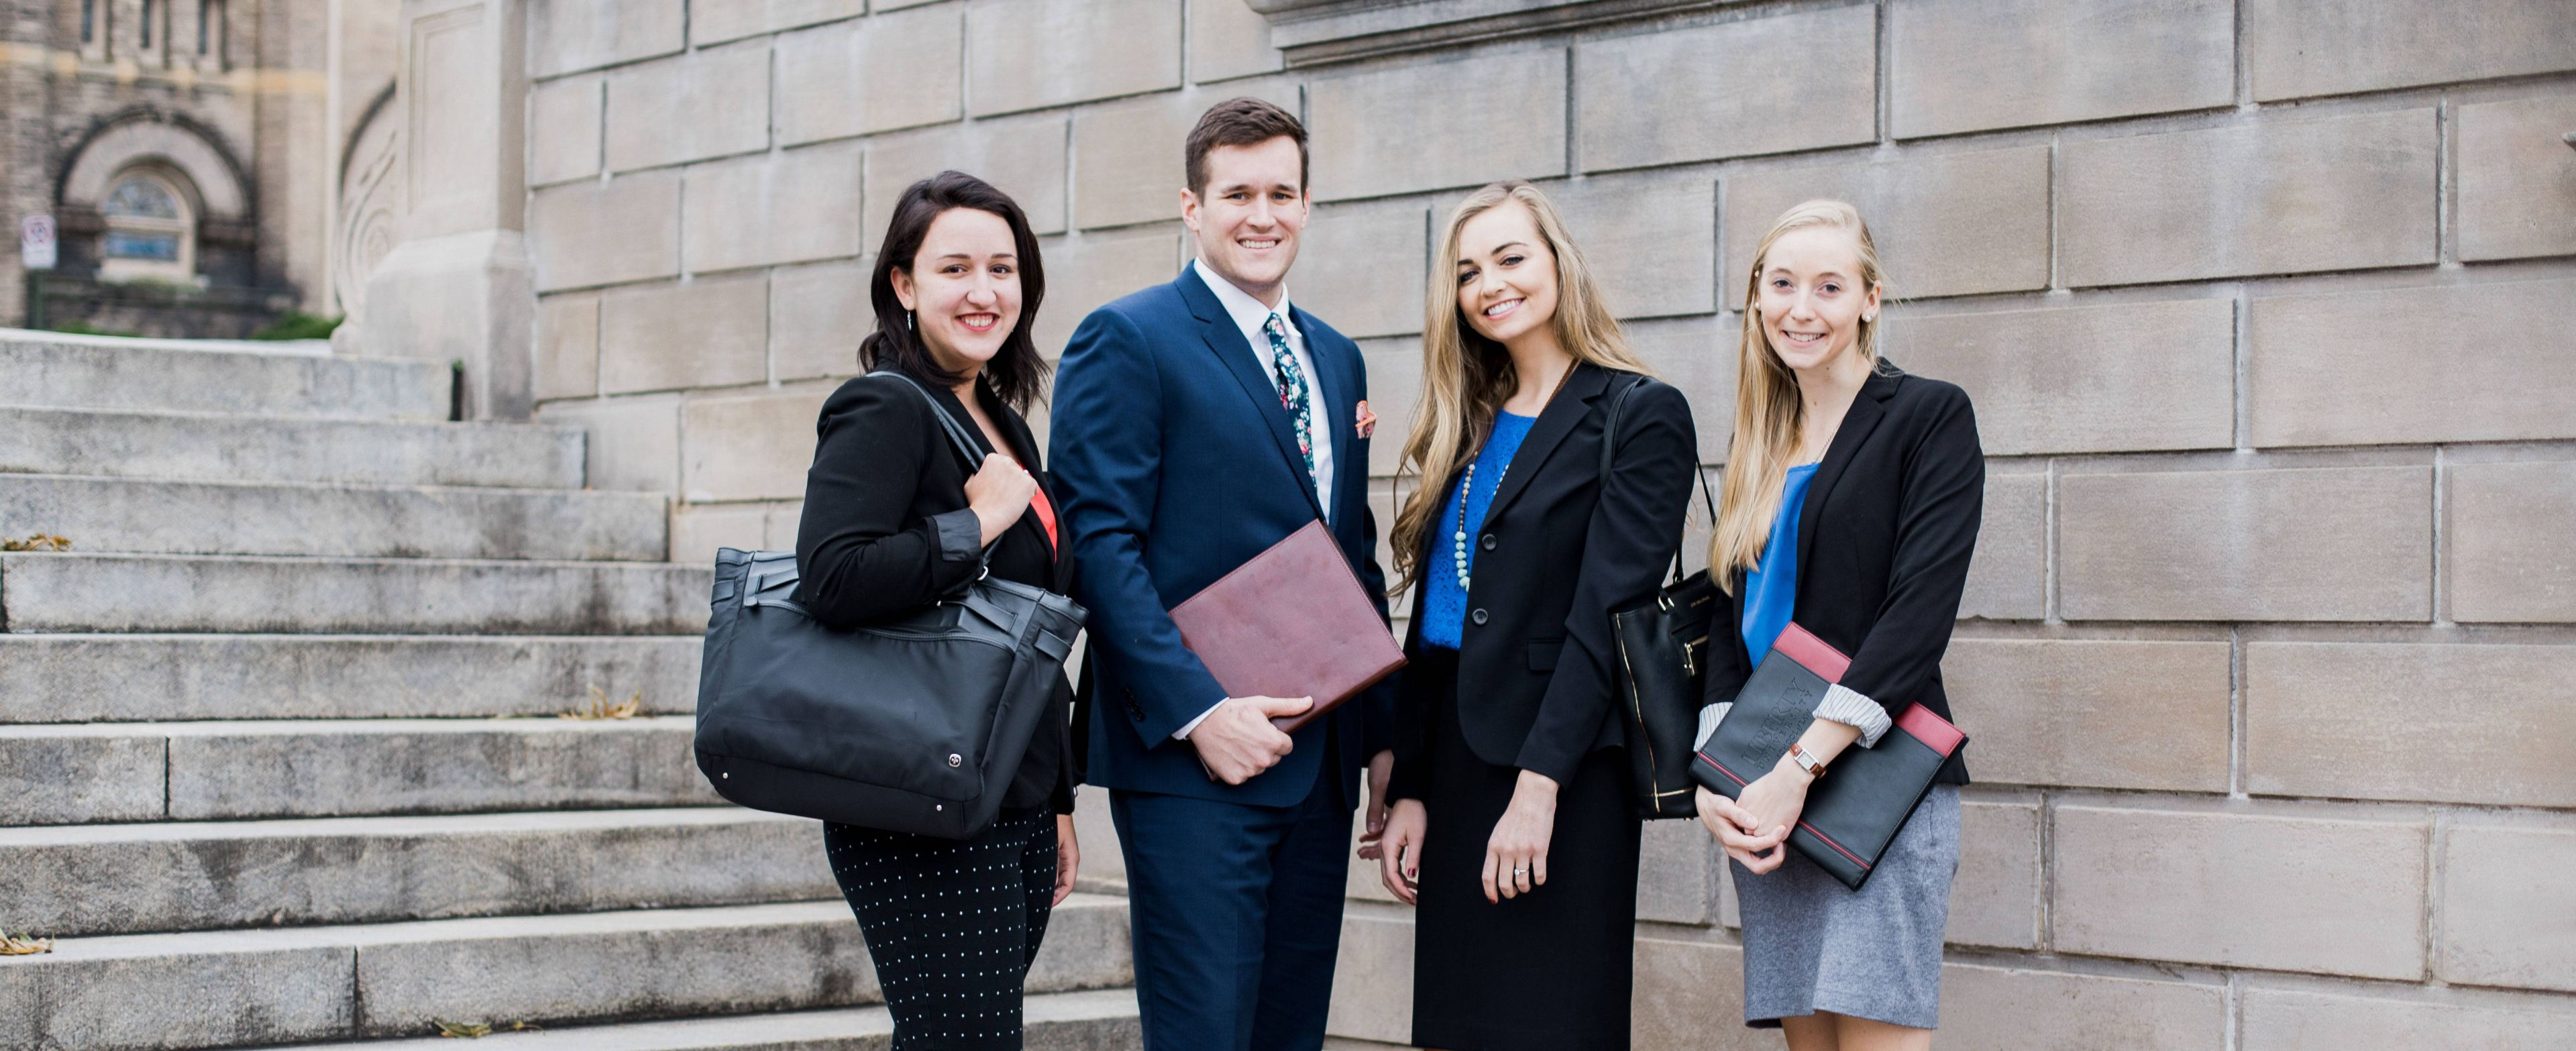 Helms School Of Government Bachelors Degrees Online Degree Programs